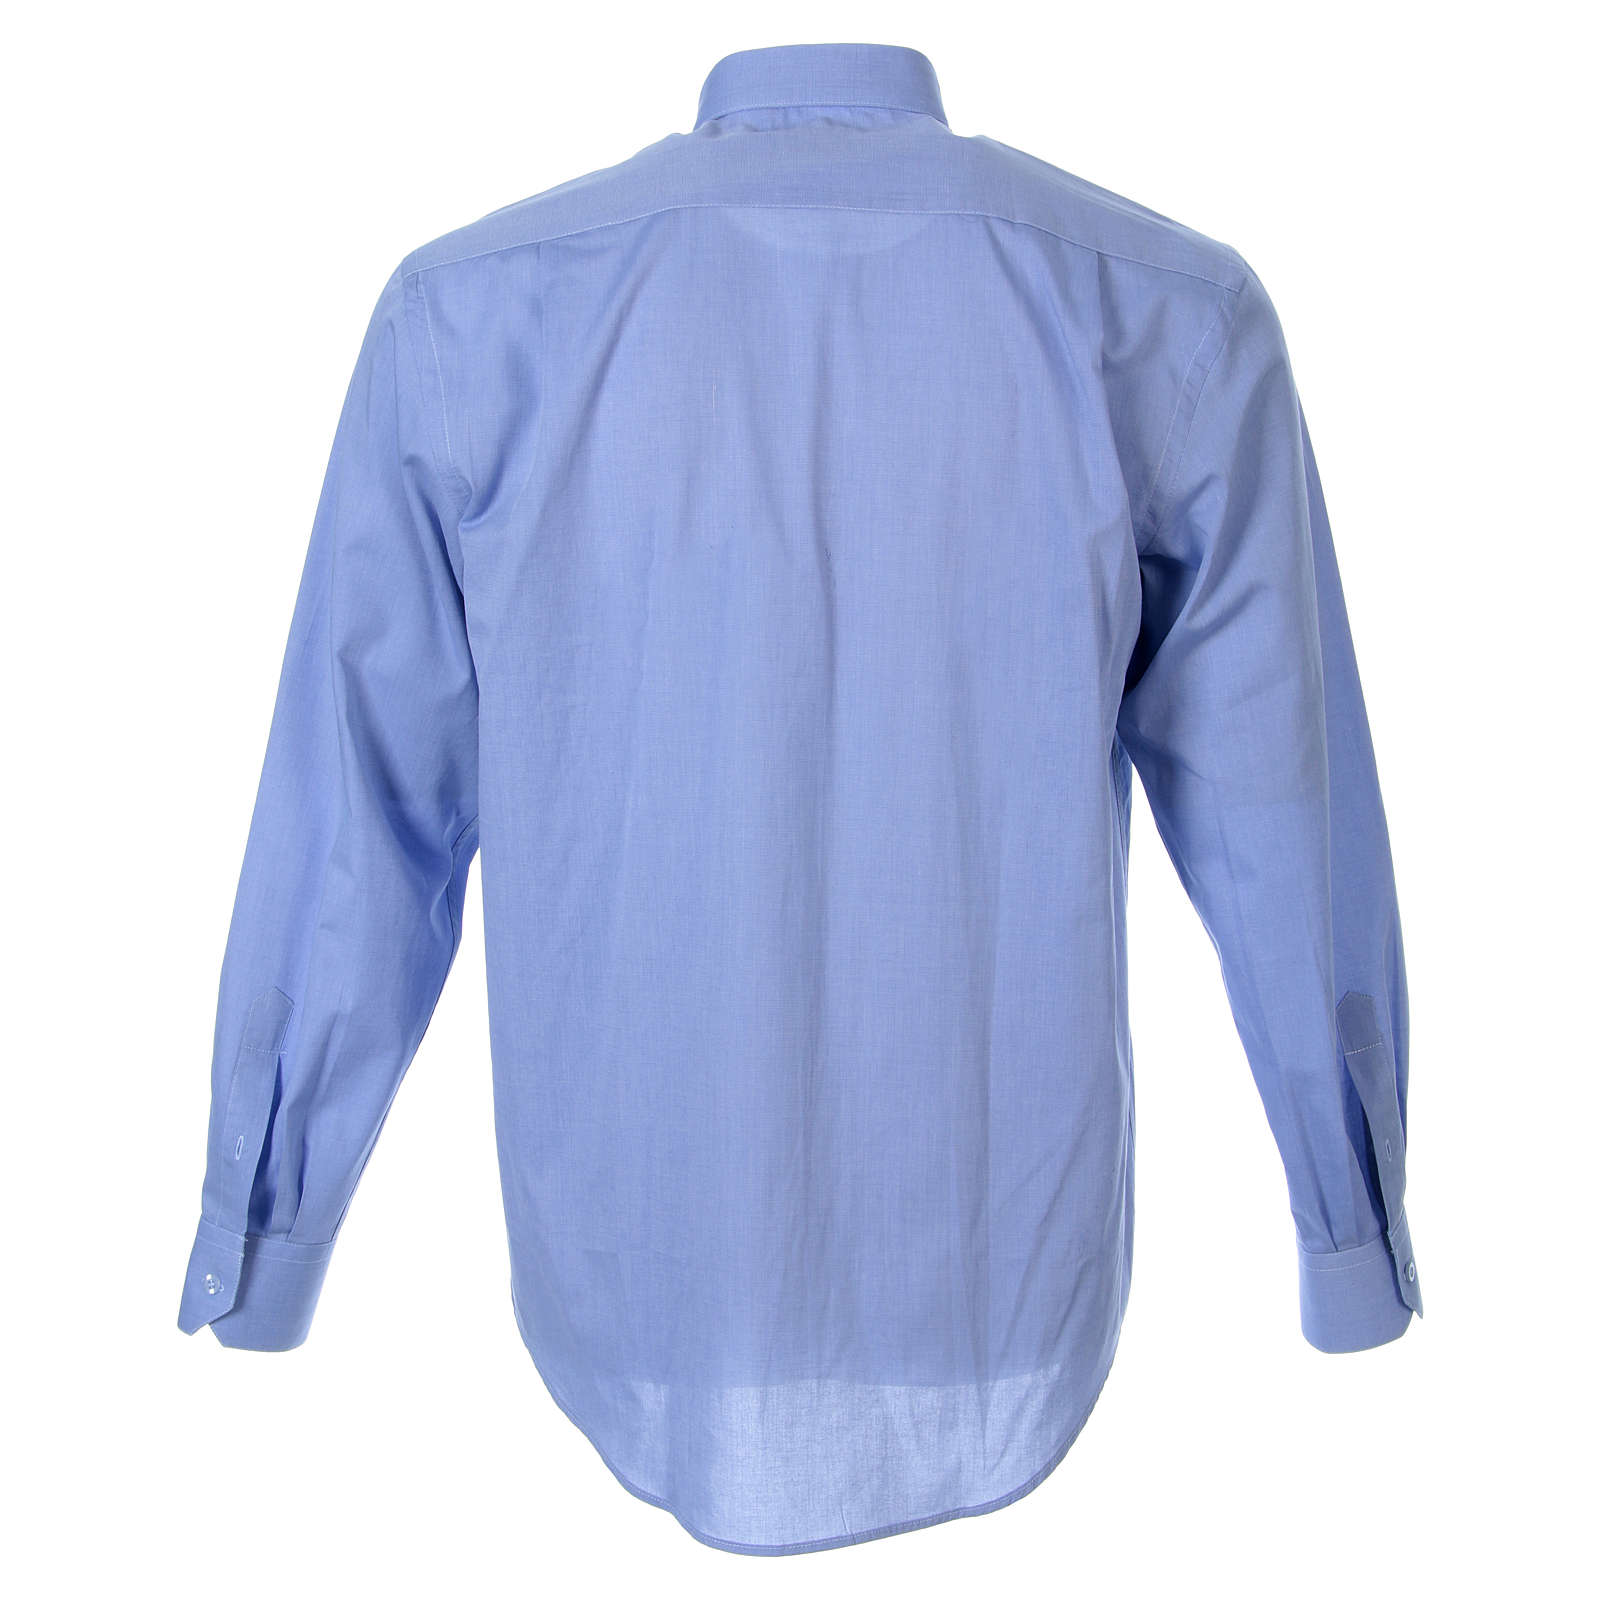 STOCK Camisa m. larga fil a fil celeste 4